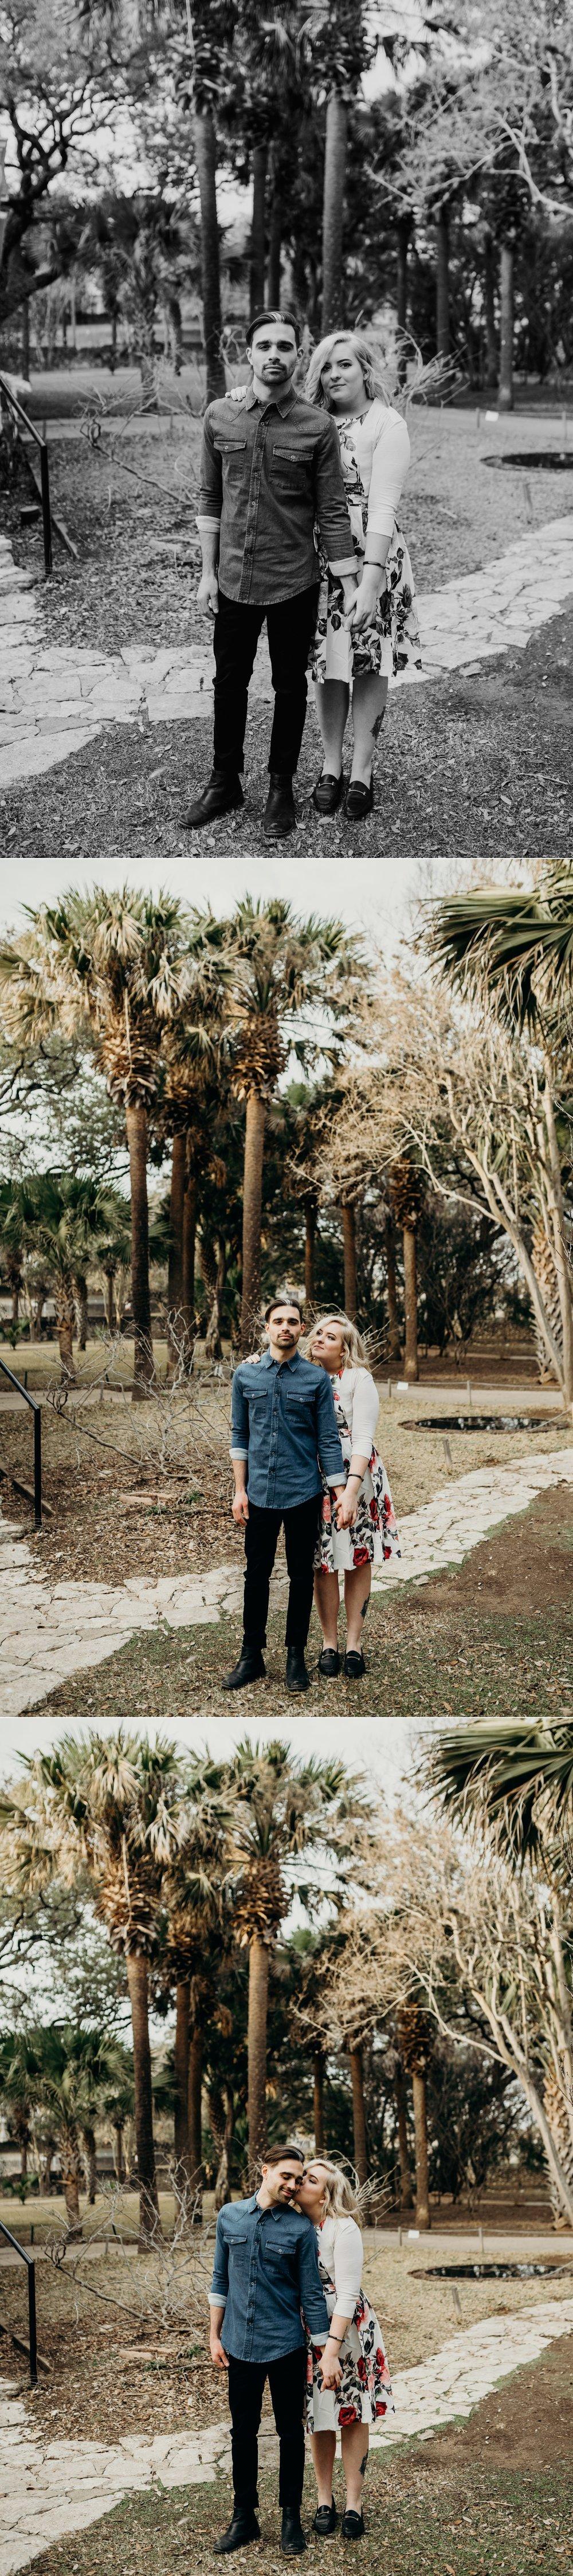 drew-andrew-texas-austin-minnesota-minneapolis-wedding-photographer-destination-elopement-intimate-adventurous_0102.jpg